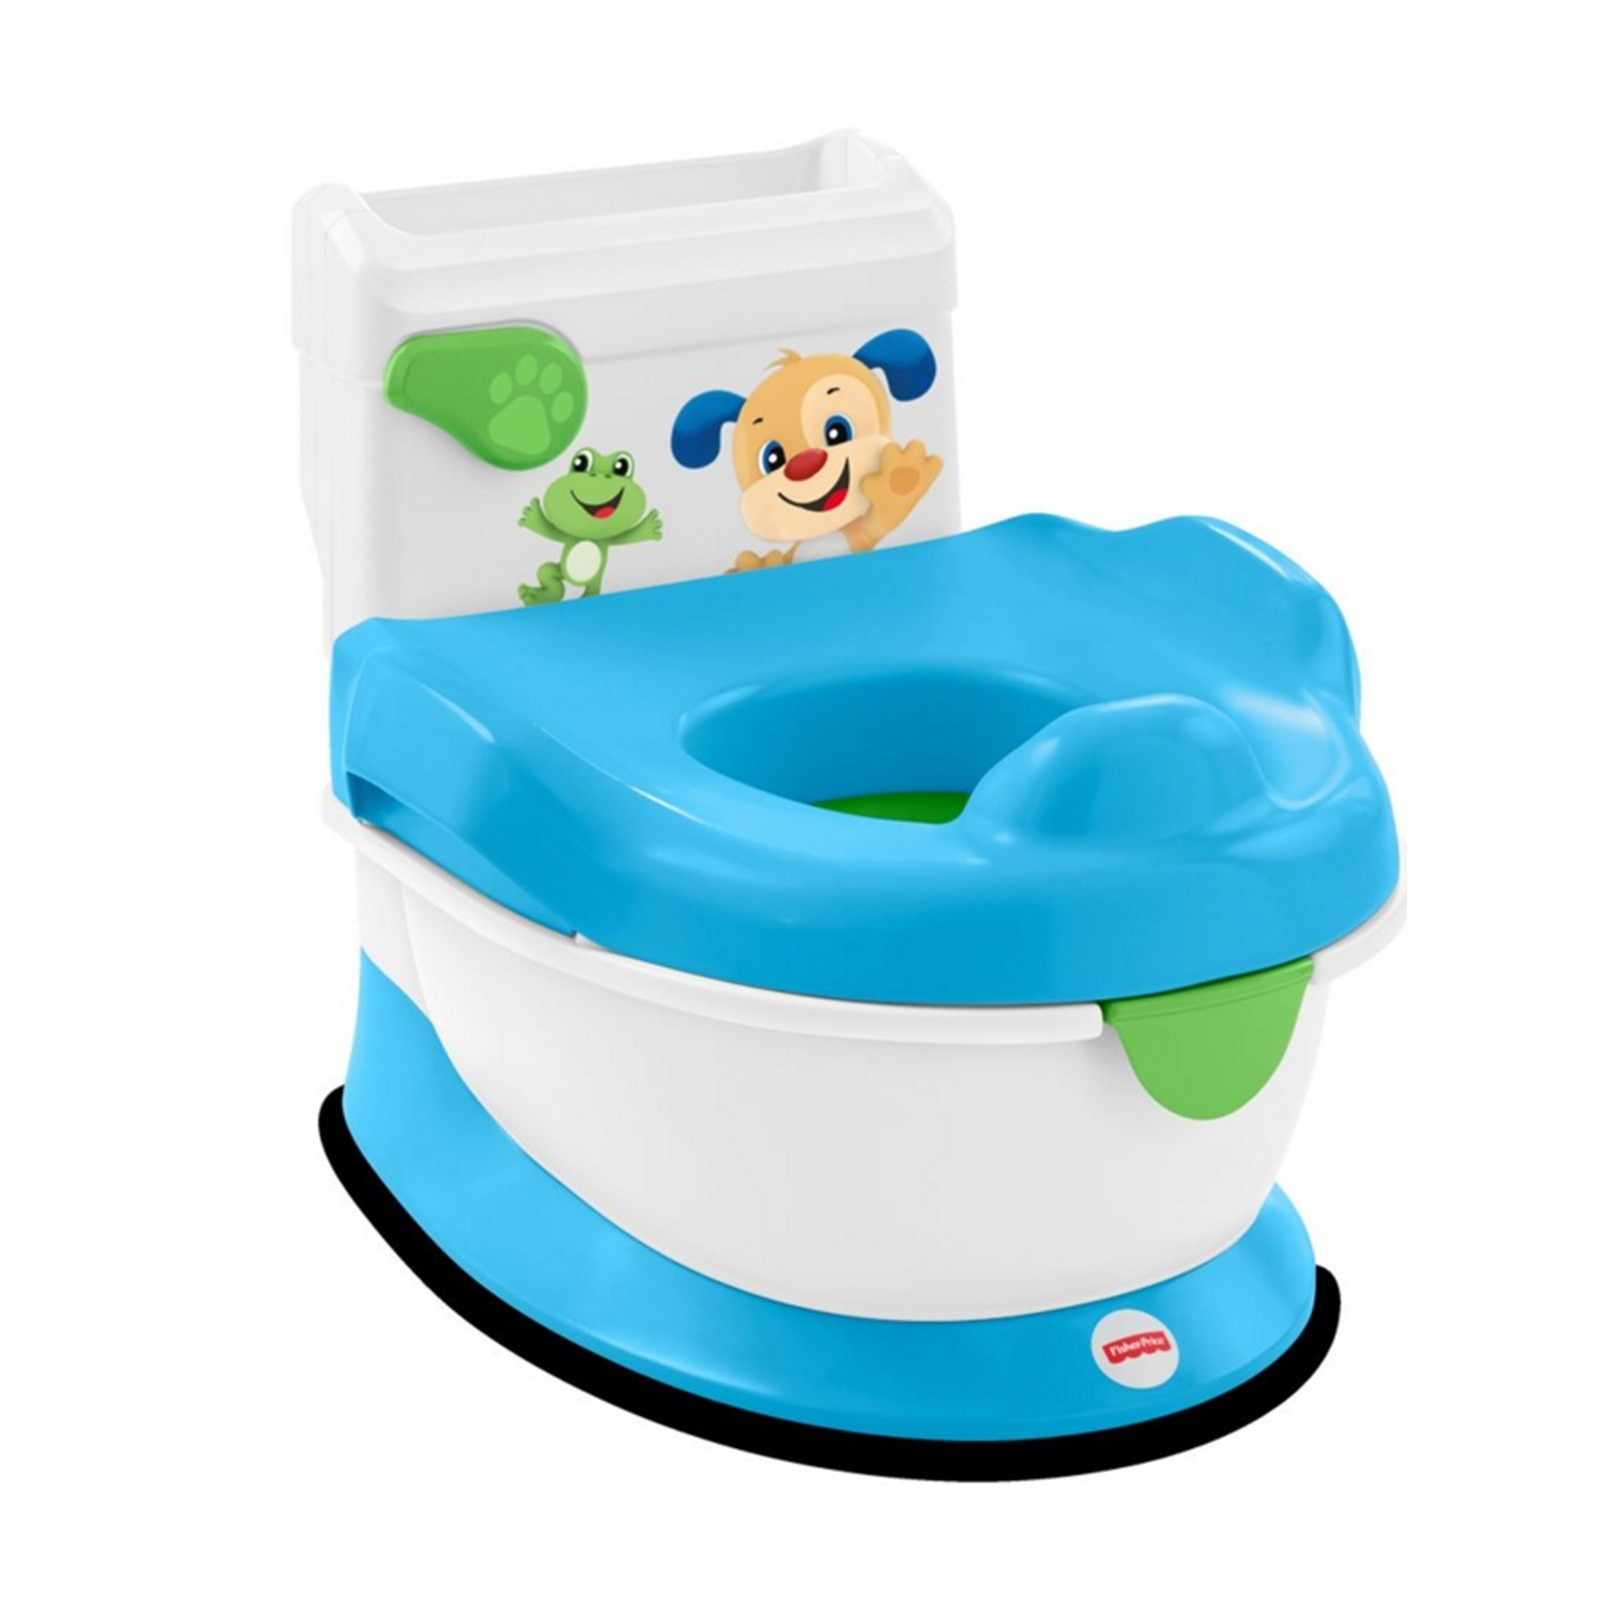 Ebebek Fisher Price Baby Training Toilet Potty Turkish